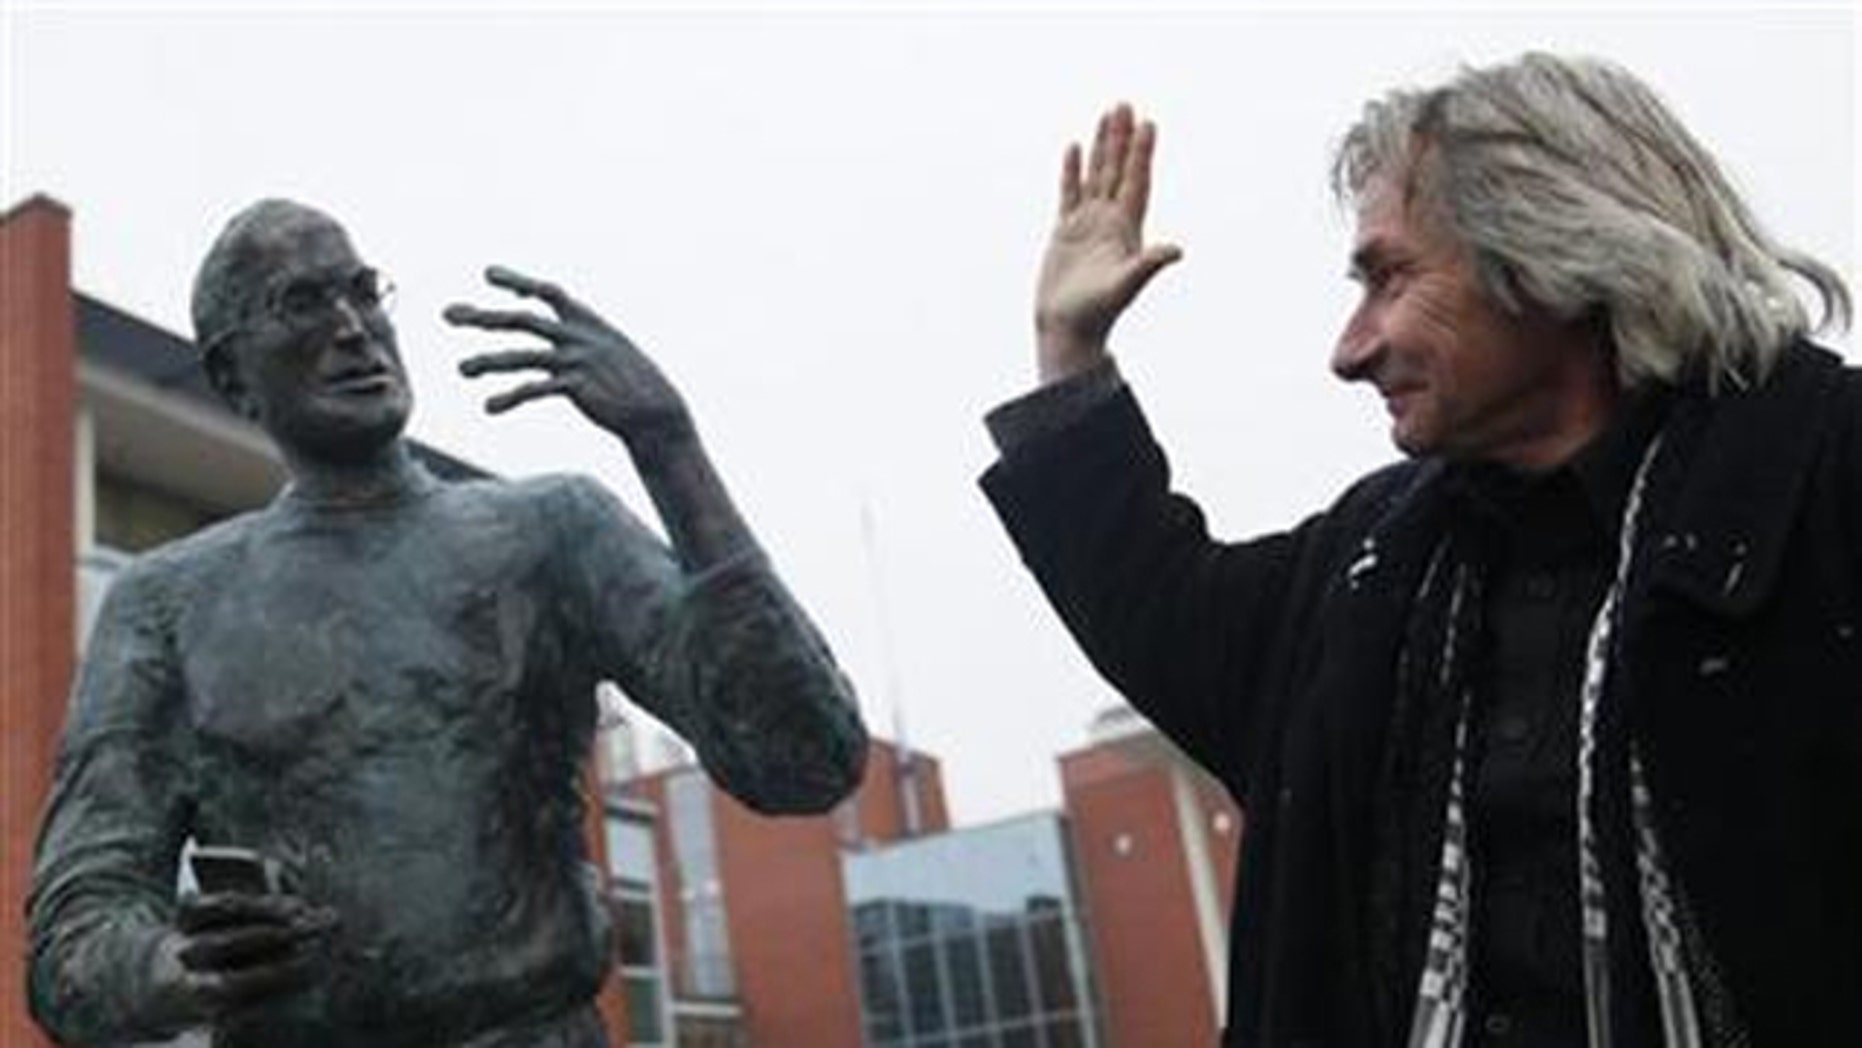 Steve Jobs immortalized in bronze.